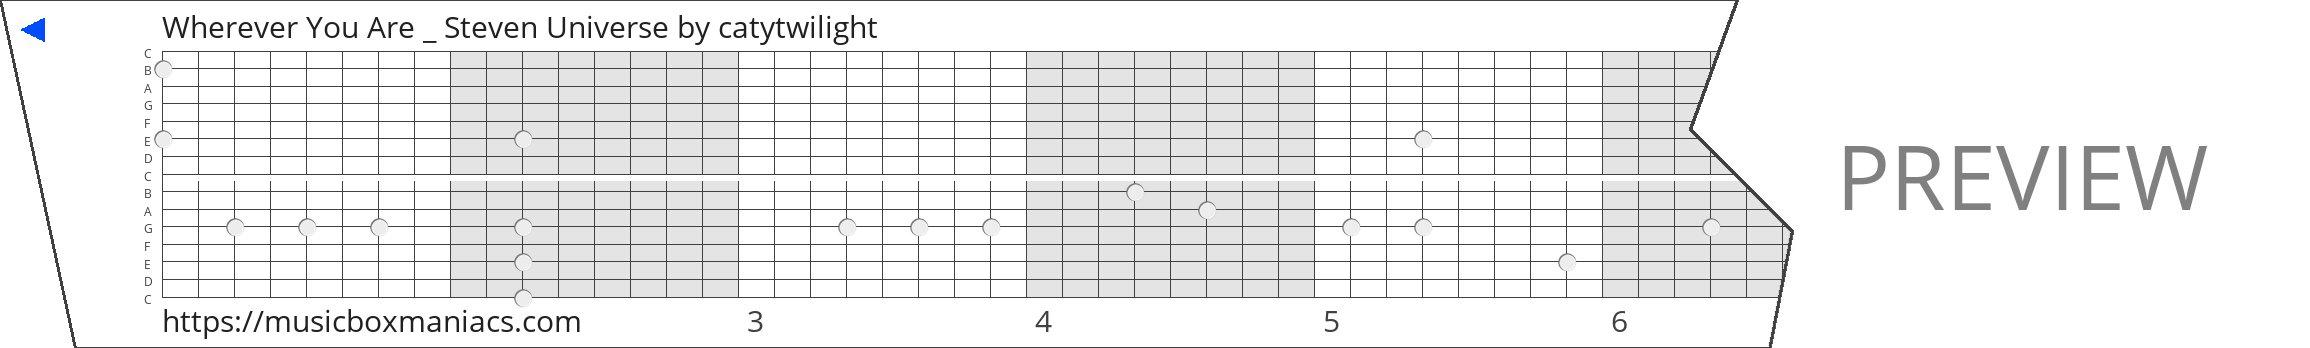 Wherever You Are _ Steven Universe 15 note music box paper strip